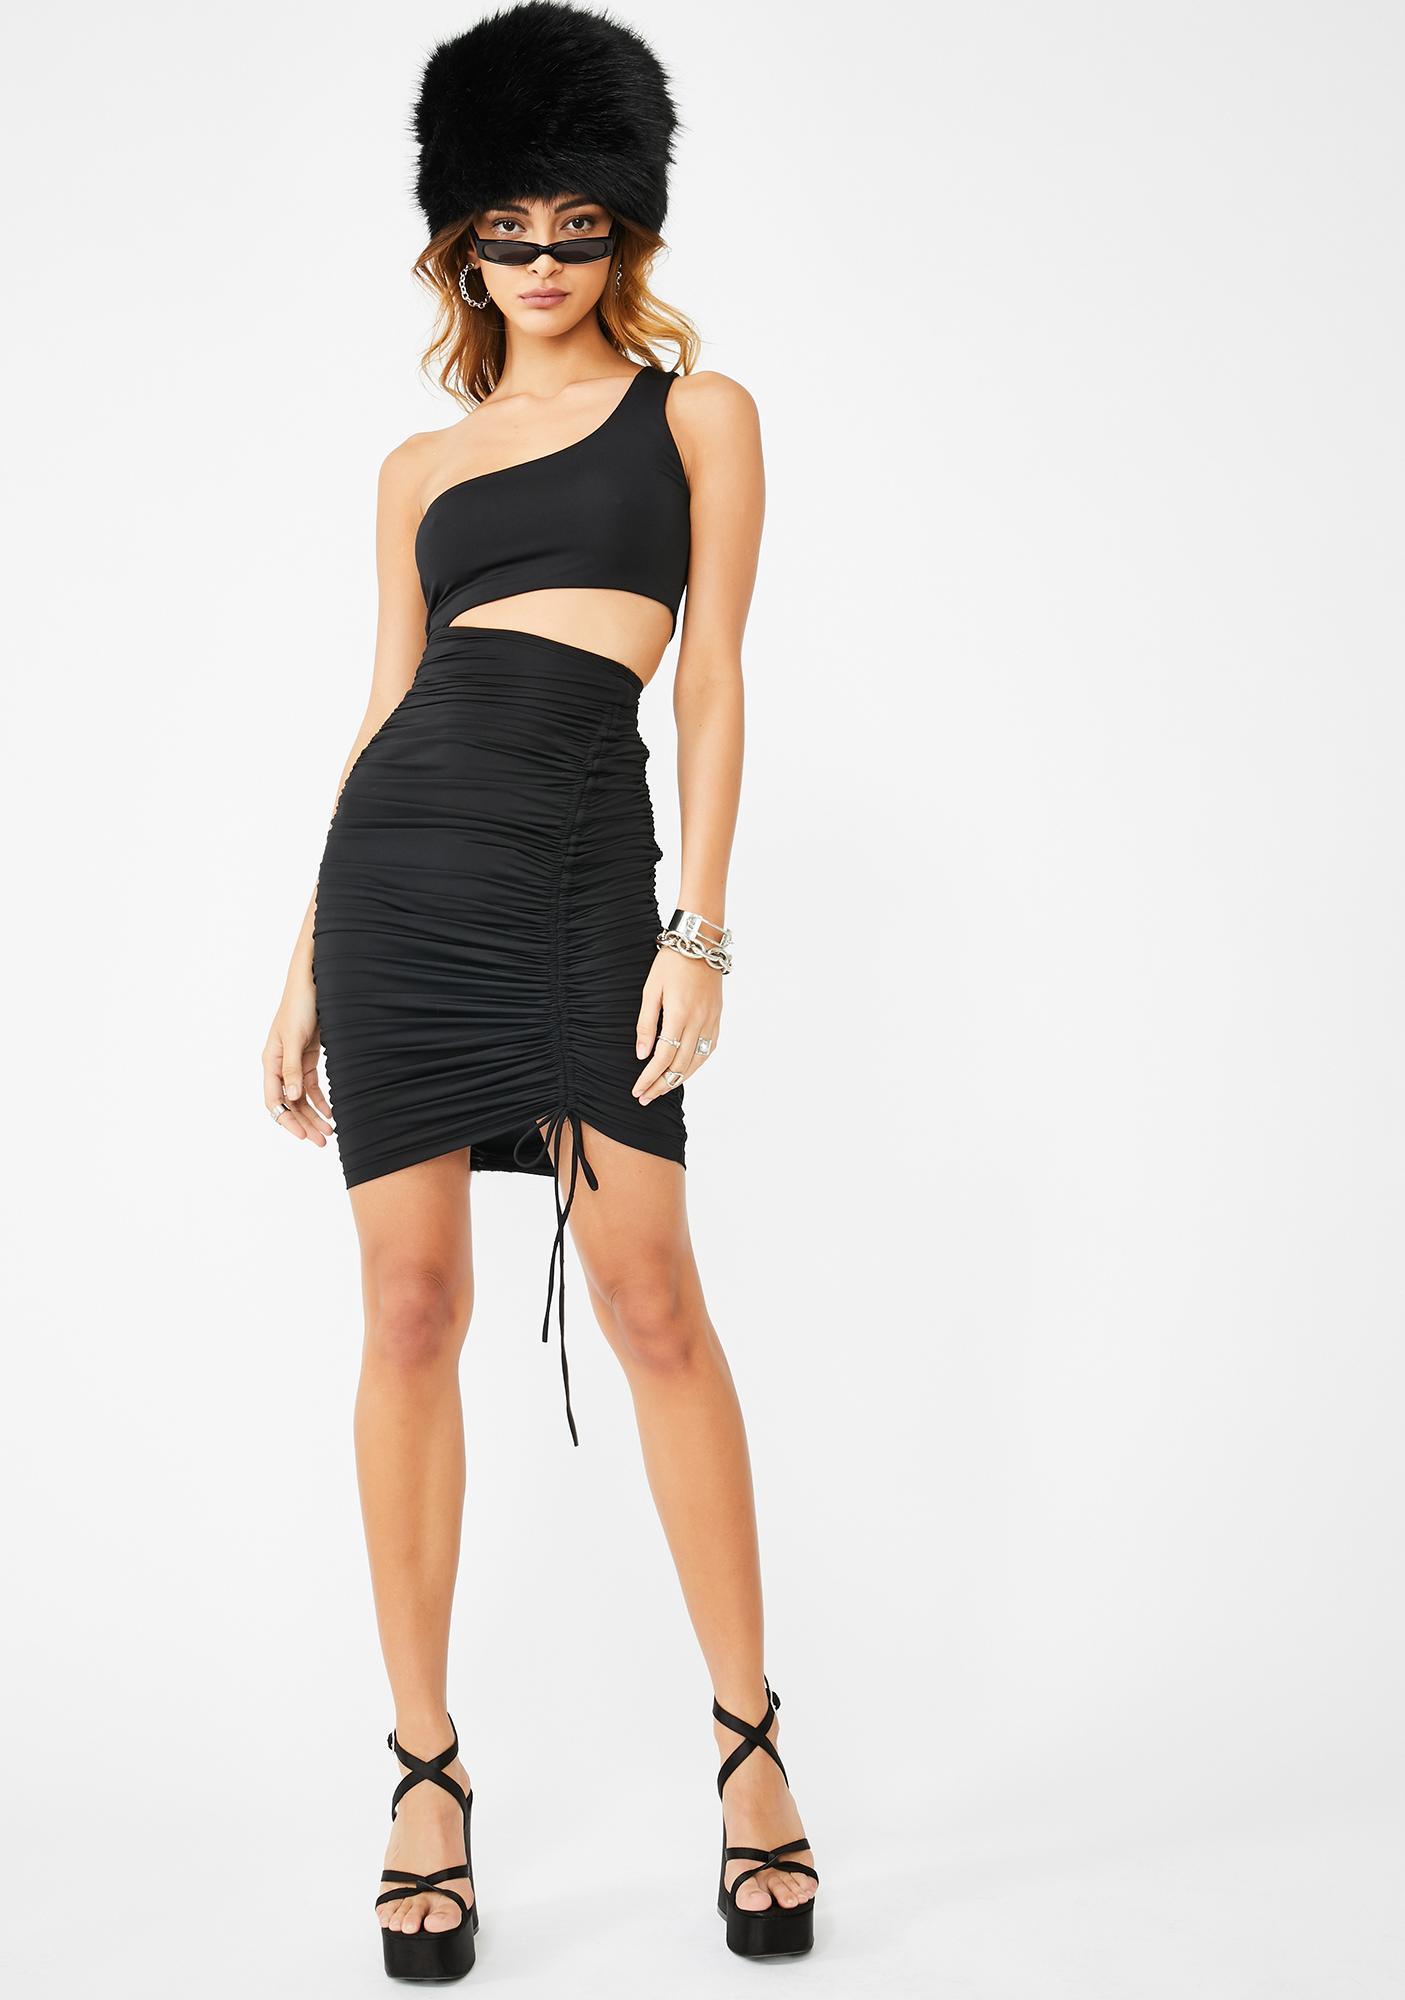 Kiki Riki Baddie Intentions Bodycon Dress